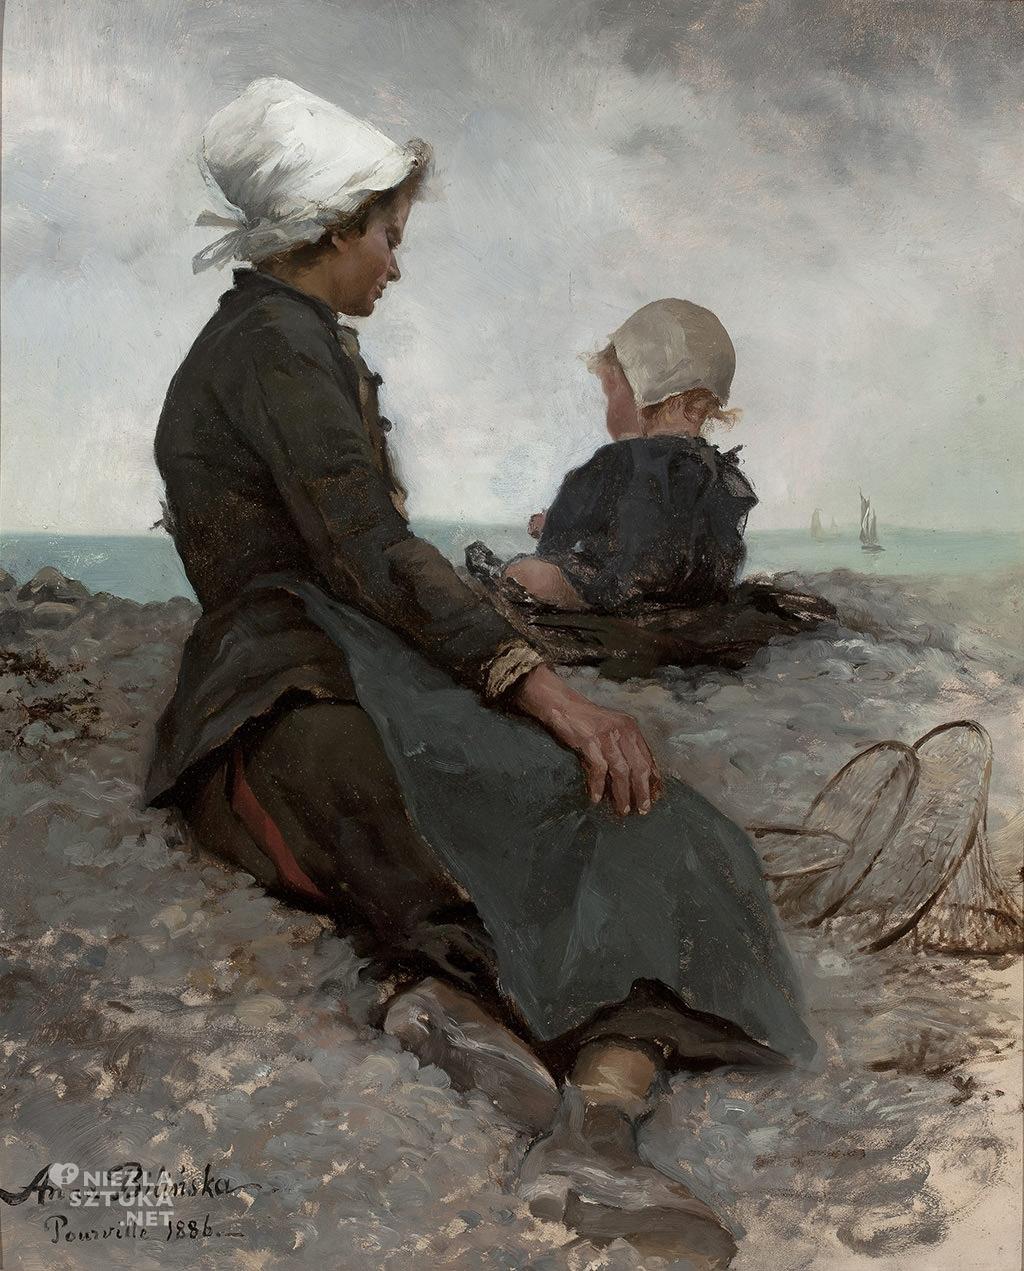 Anna Bilińska, Nad brzegiem morza, sztuka polska, Niezła sztuka